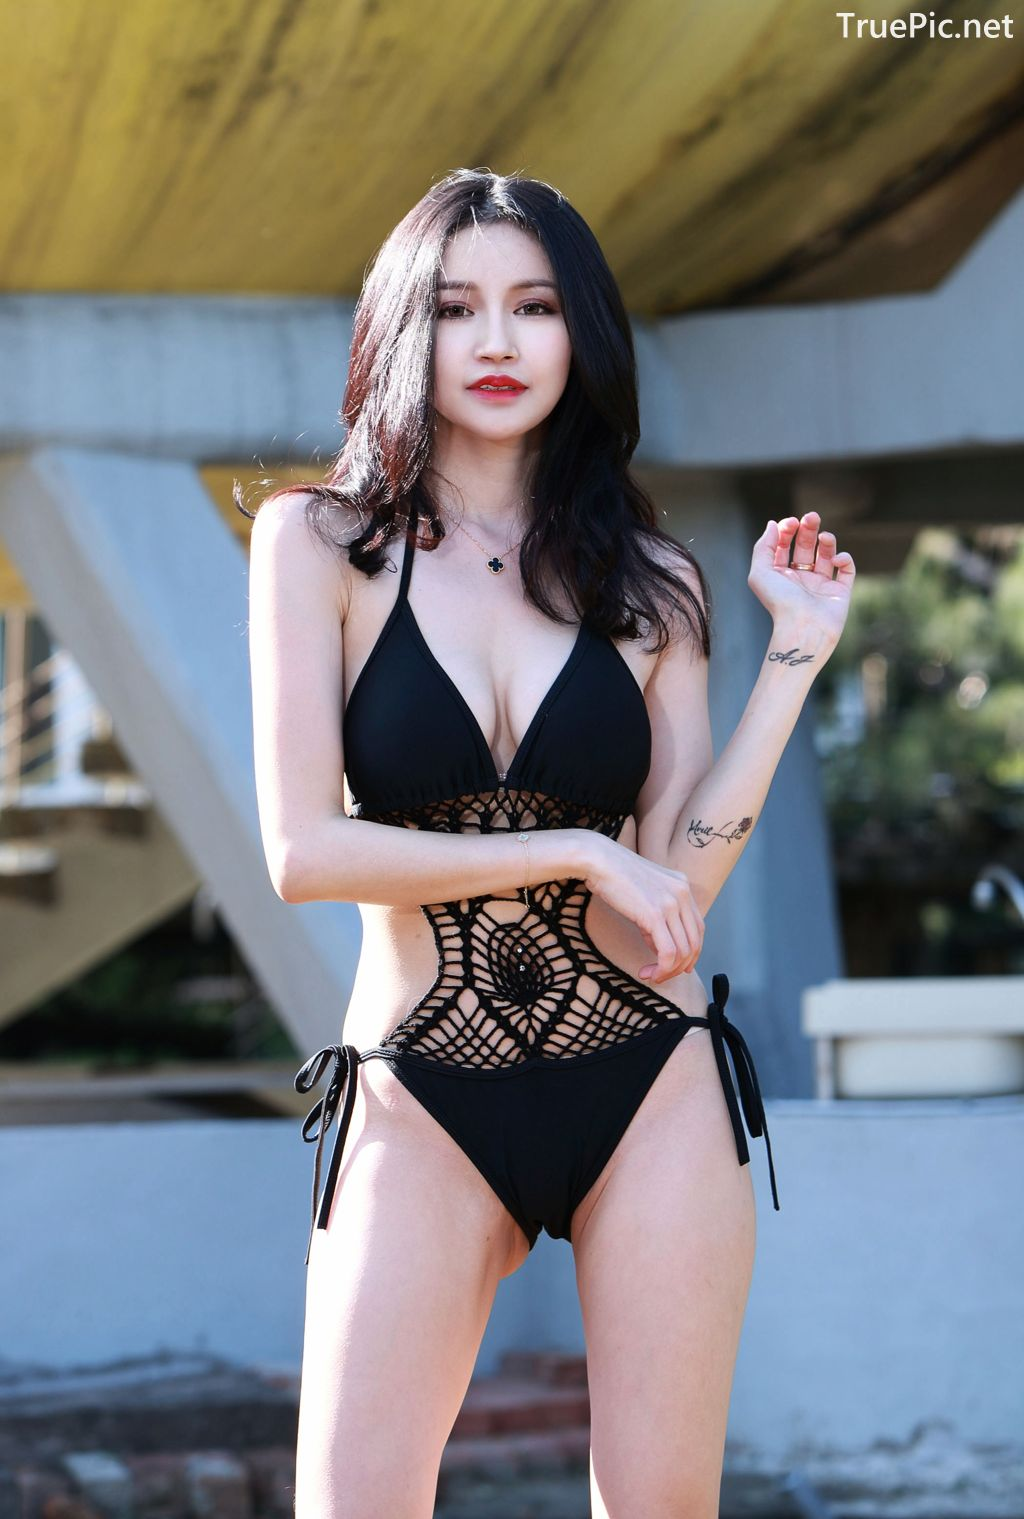 Image-Taiwanese-Model-艾薉-Long-Legs-And-Lovely-Bikini-Girl-TruePic.net- Picture-6